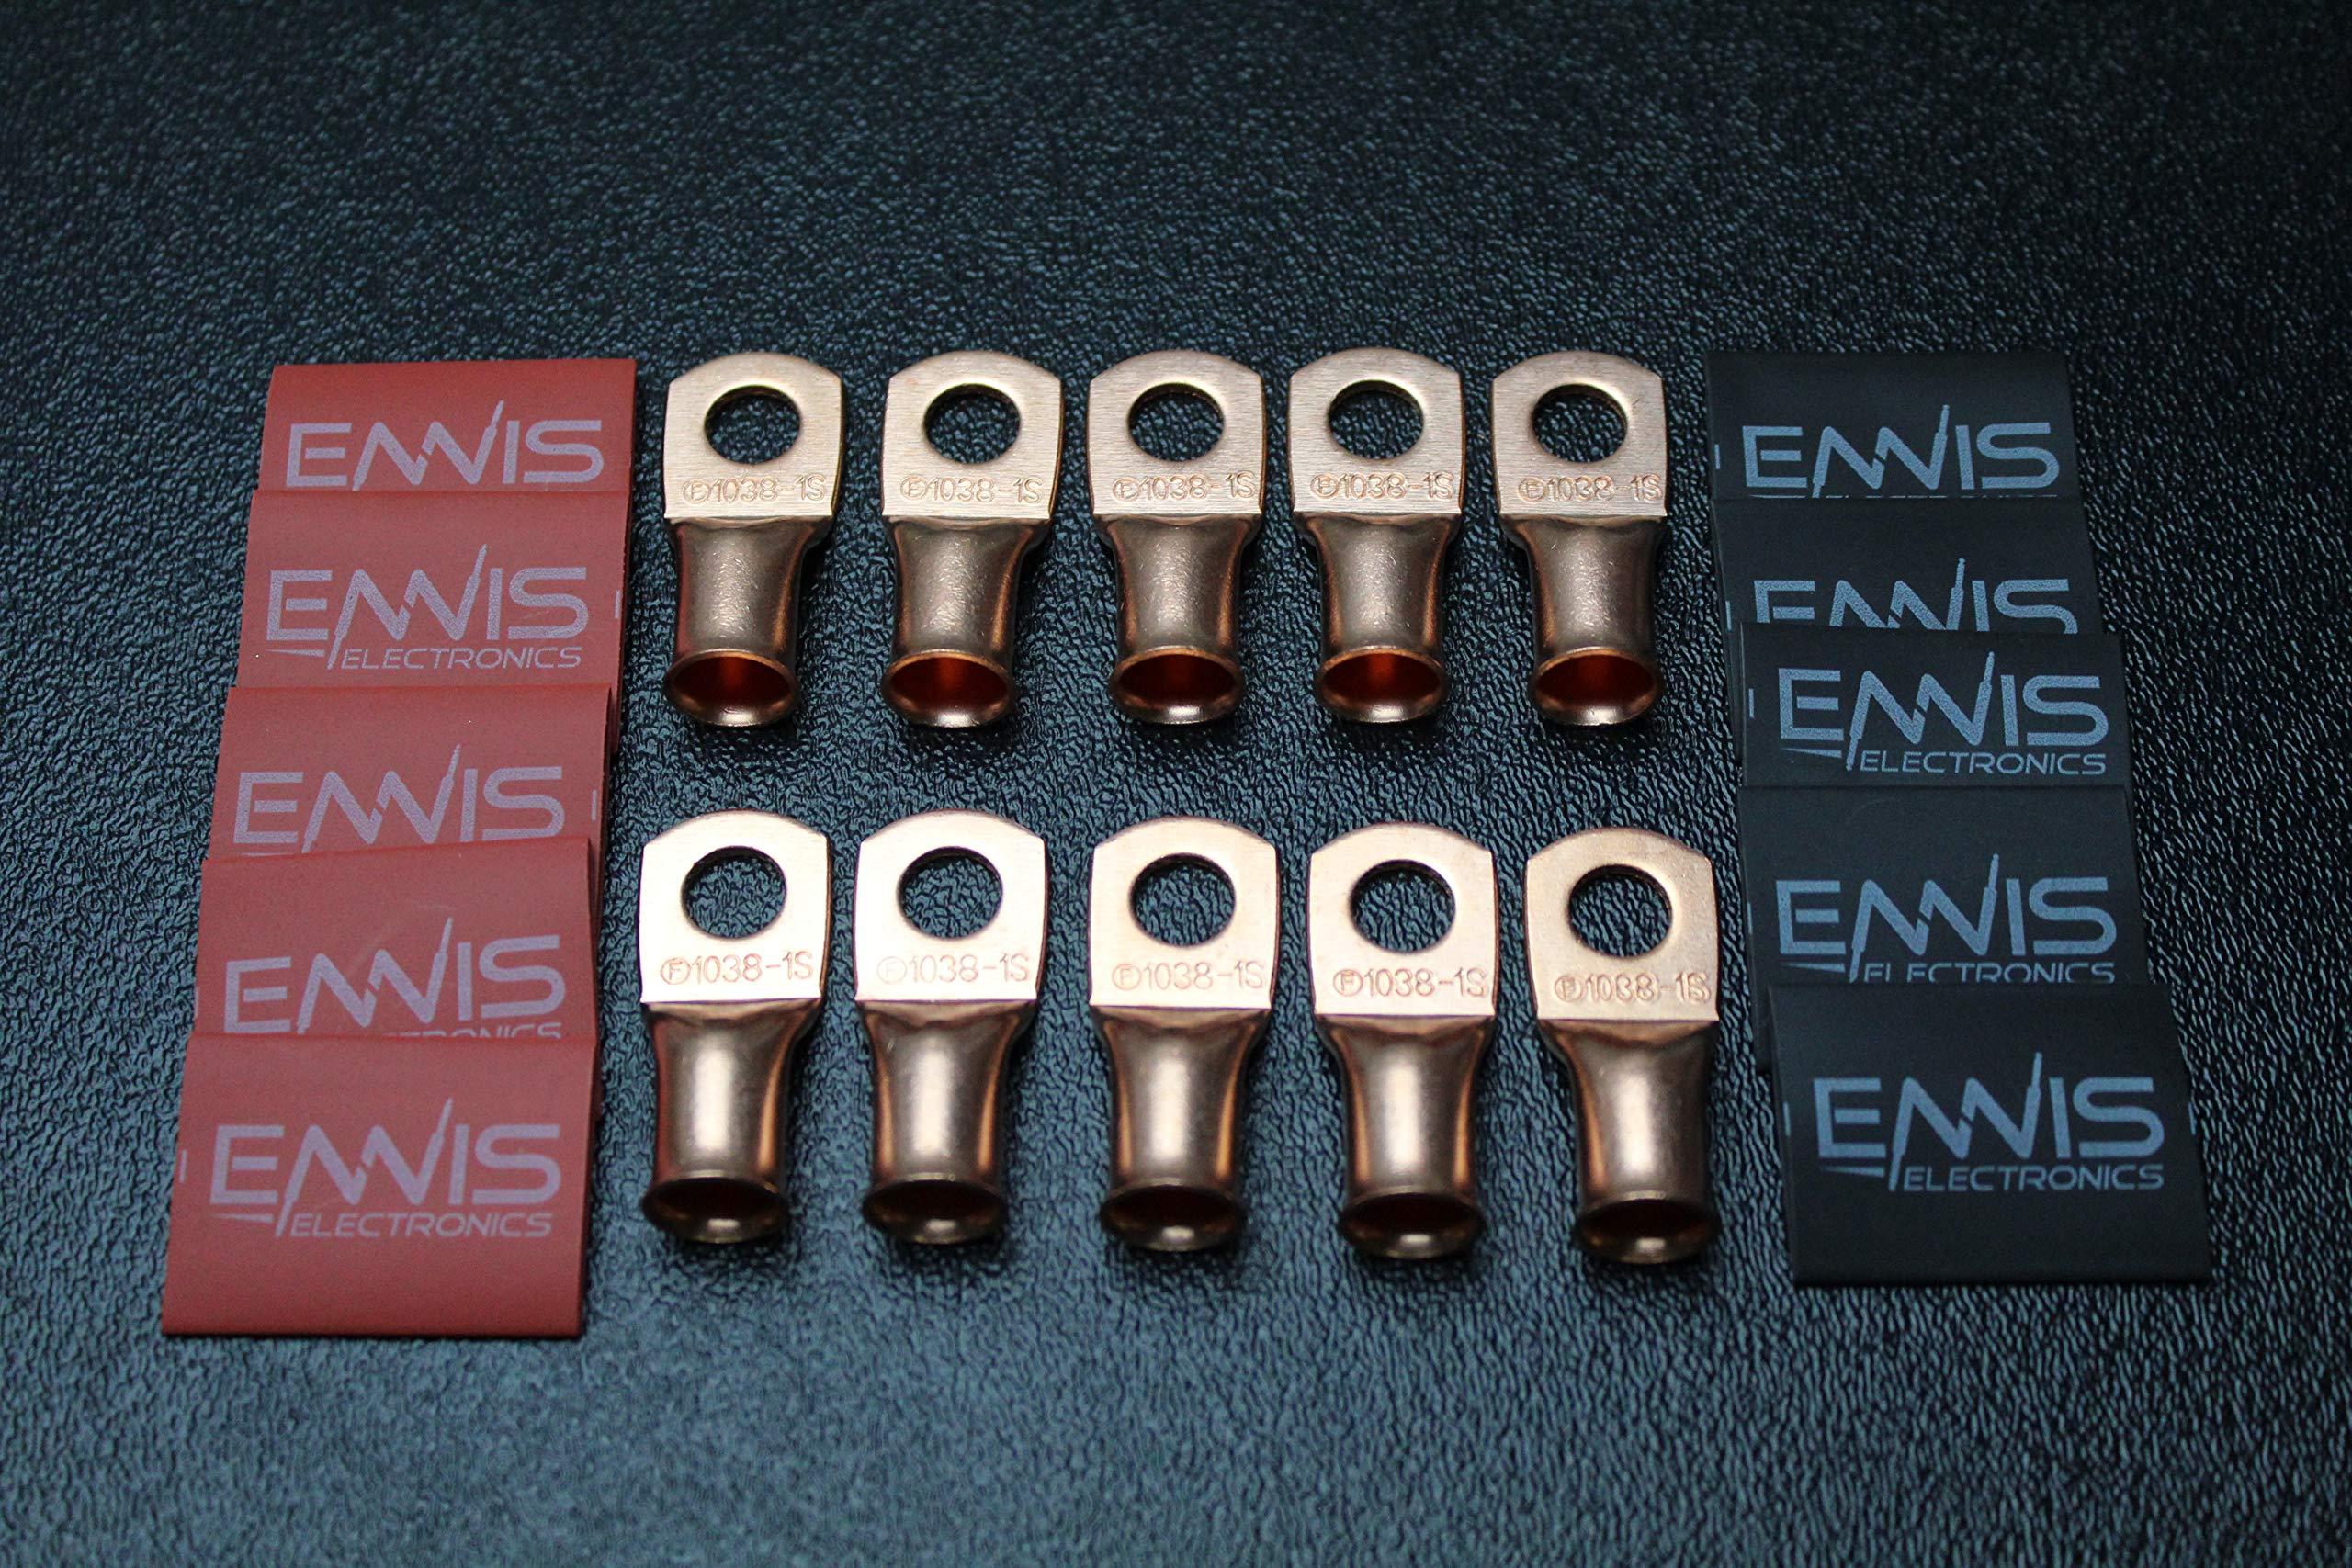 1/0 Gauge Copper 5/16 Ring 10 PK W/HEATSHRINK RED/Black Lug Battery Terminal Connector AWG CUR10516